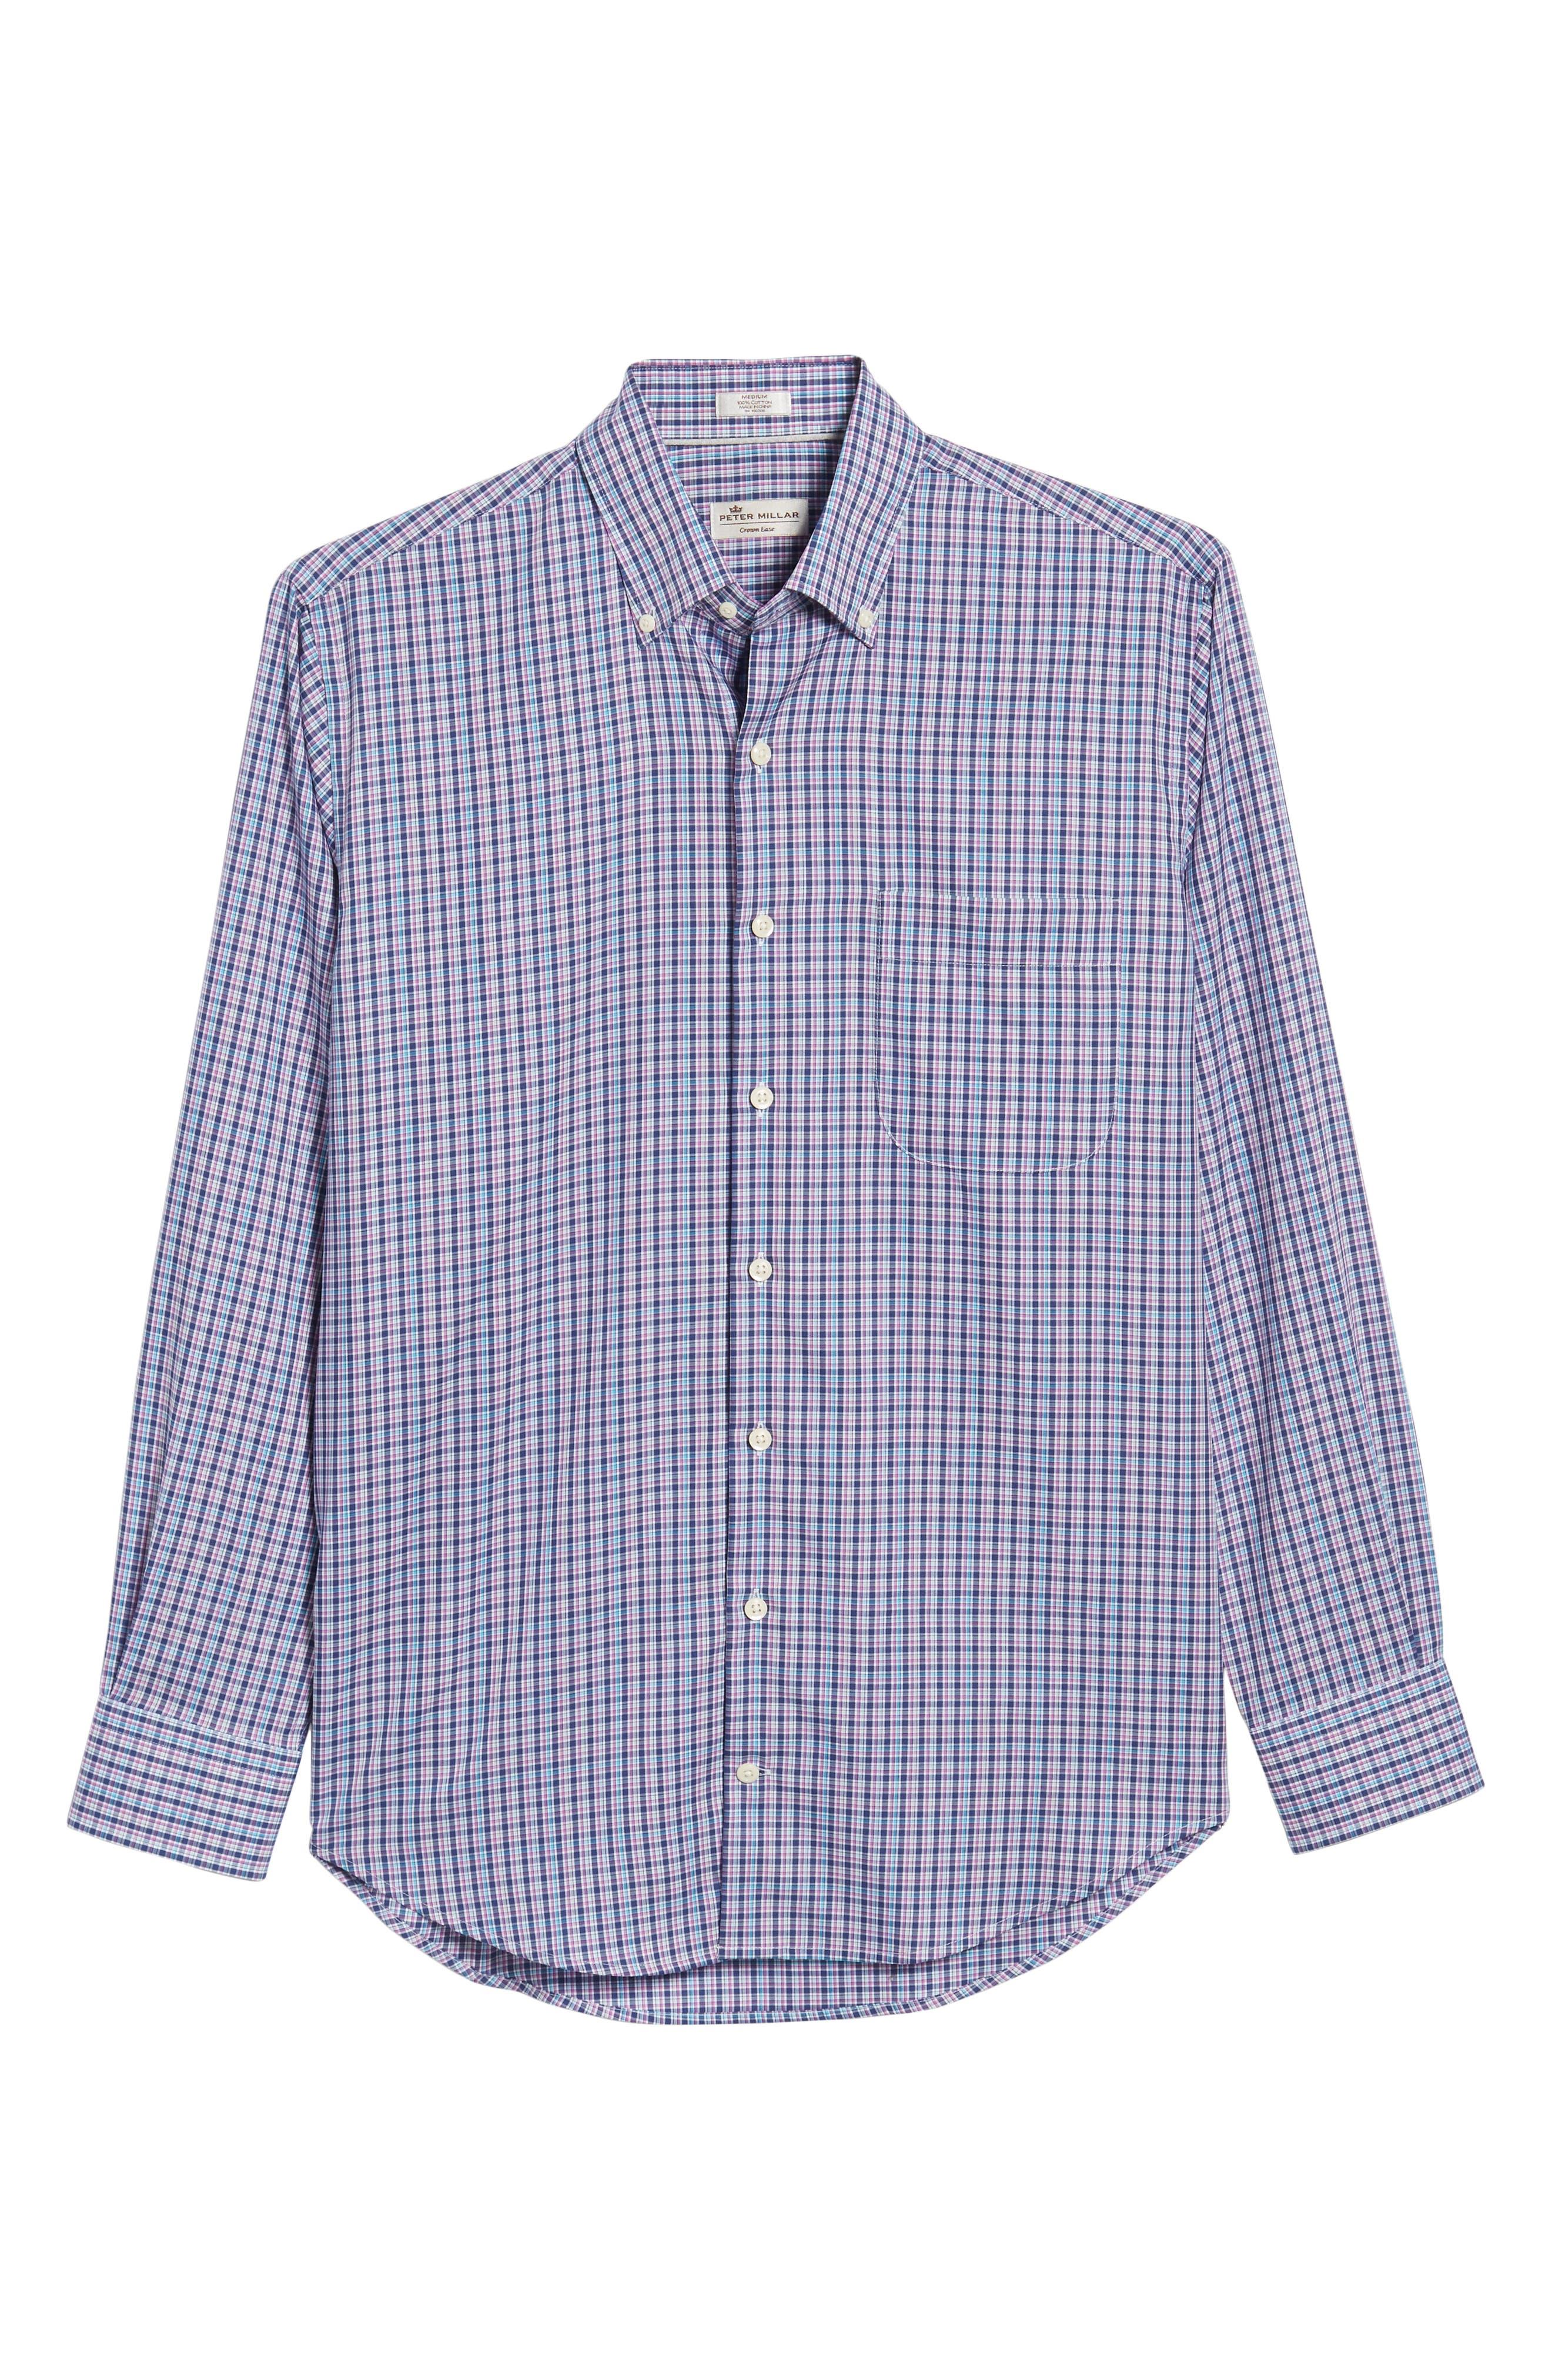 PETER MILLAR,                             Crown Ease Kaci Plaid Sport Shirt,                             Alternate thumbnail 6, color,                             400